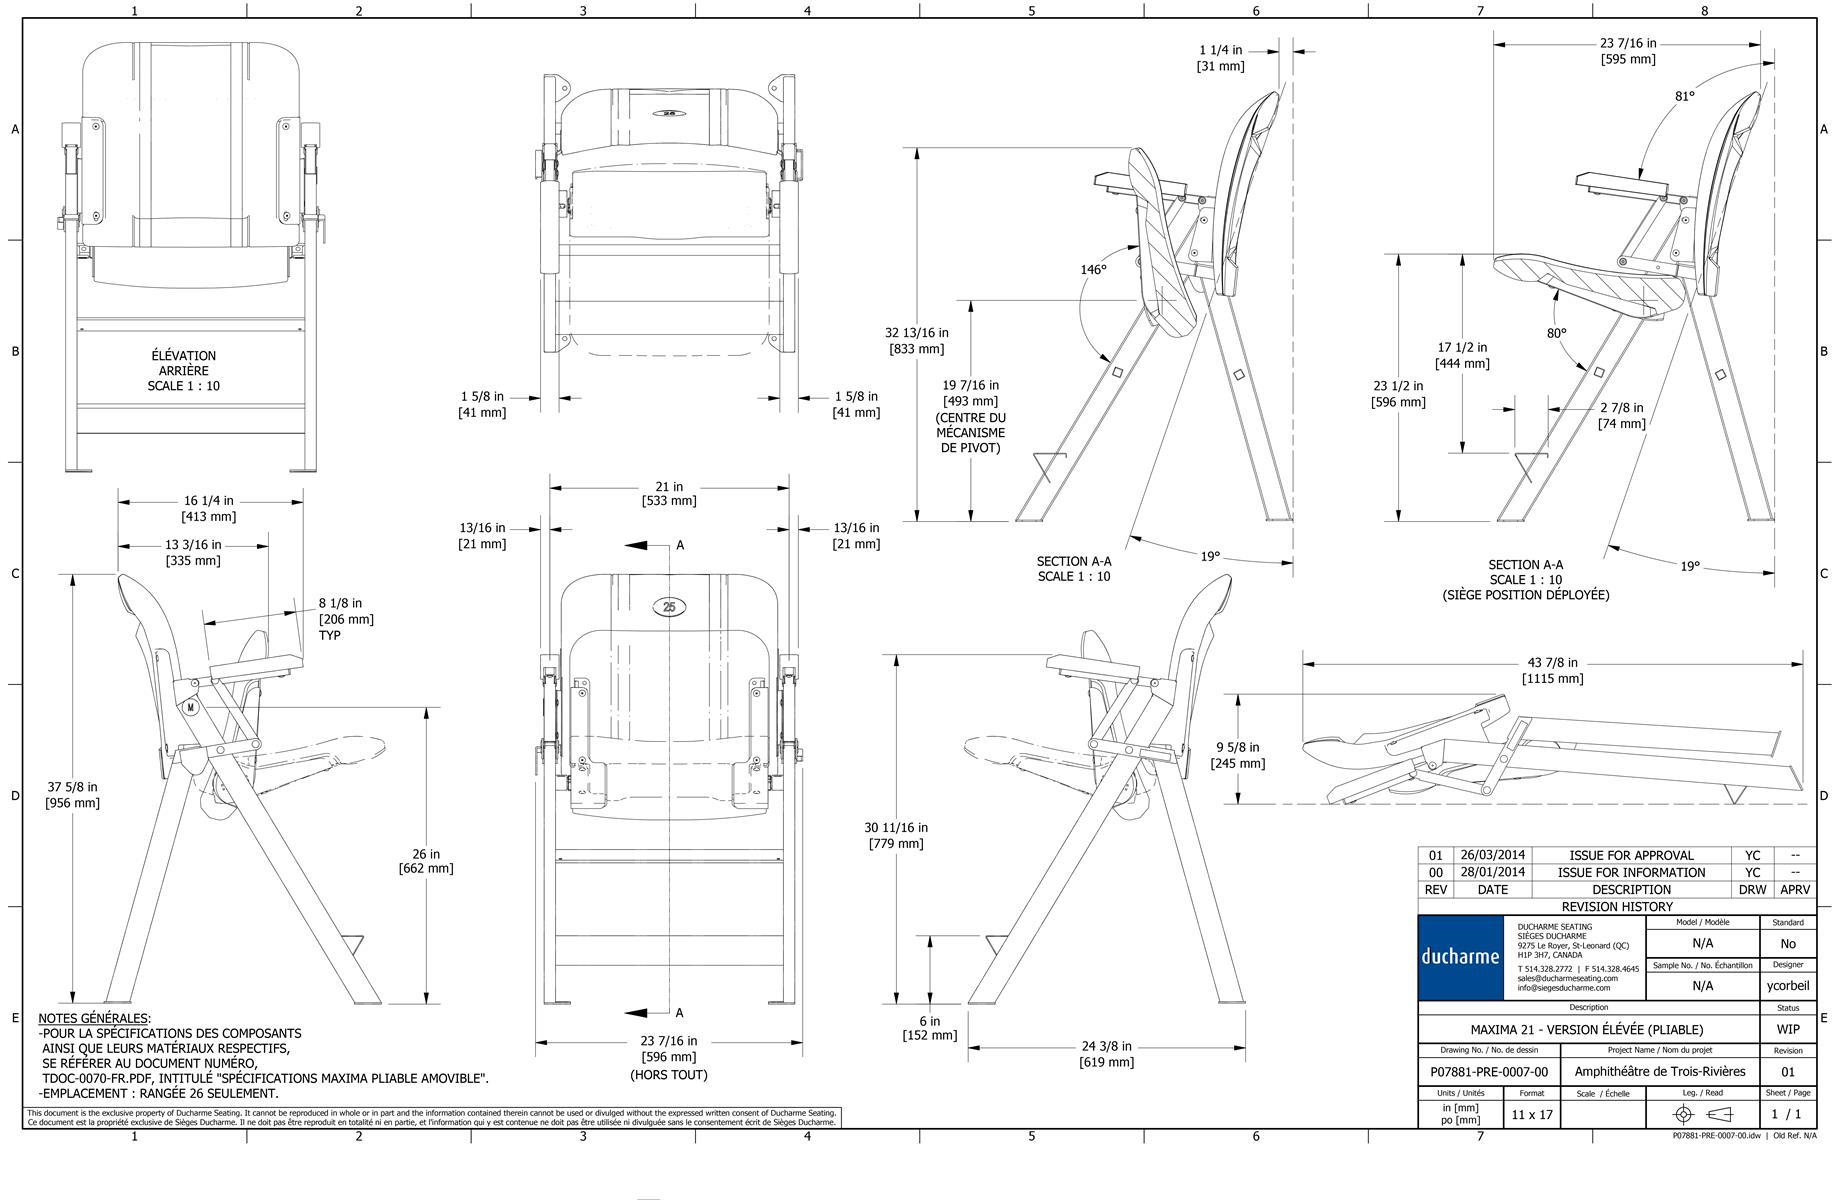 ATRV-Sièges-amovibles-04_1841x1200.jpg